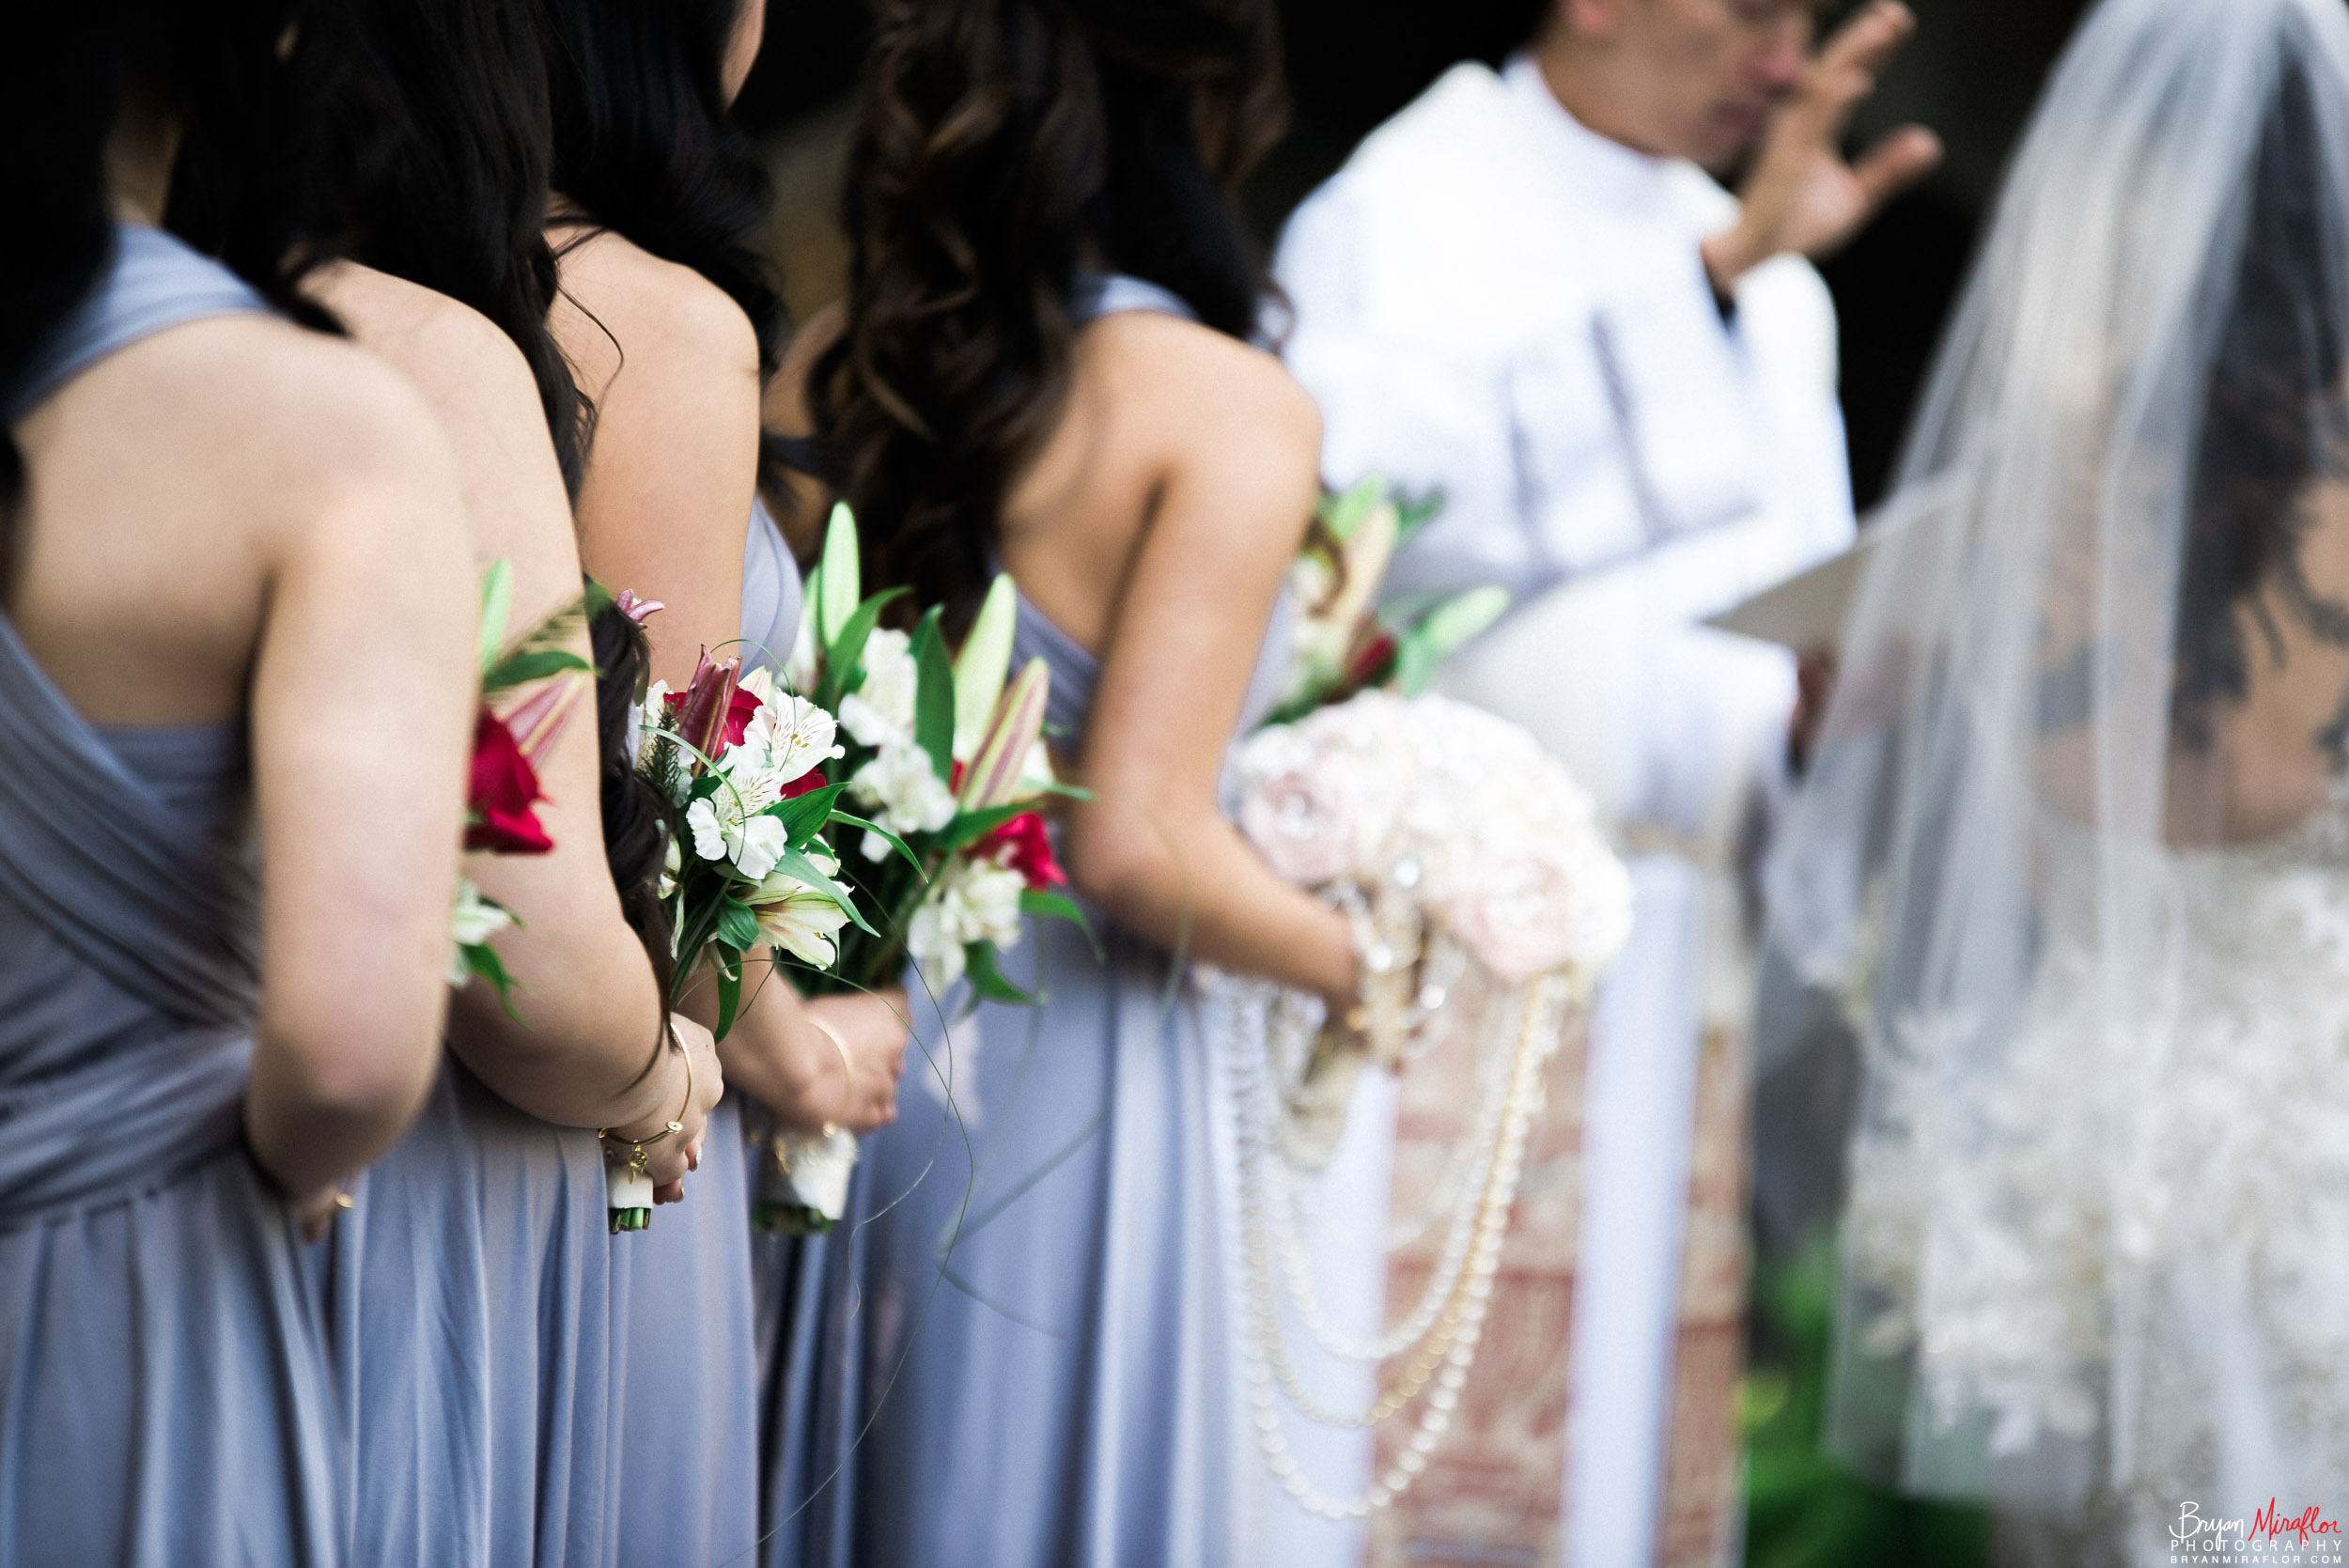 Bryan-Miraflor-Photography-Hannah-Jonathan-Married-Grand-Traditions-Estate-Gardens-Fallbrook-20171222-105.jpg